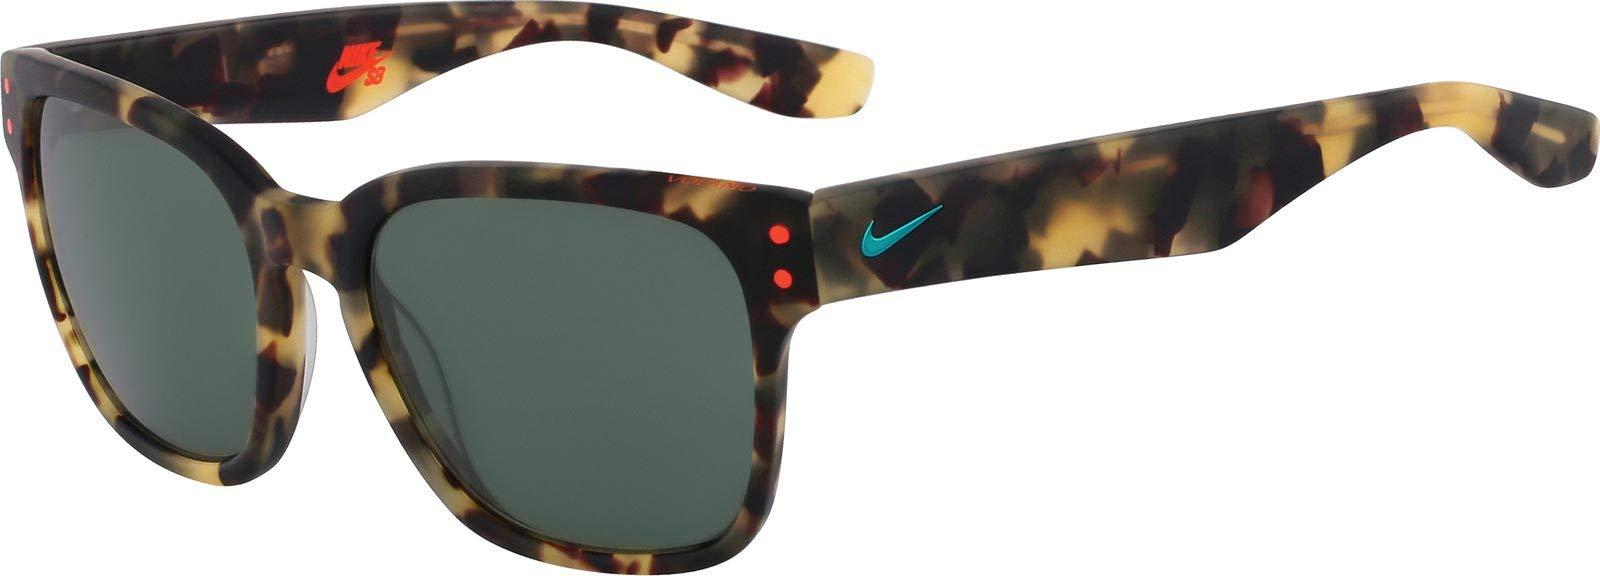 Nike EV0877-203 Volano Sunglasses (One Size), Matte Tokyo Tortoise/Hyper Jade, Teal Lens